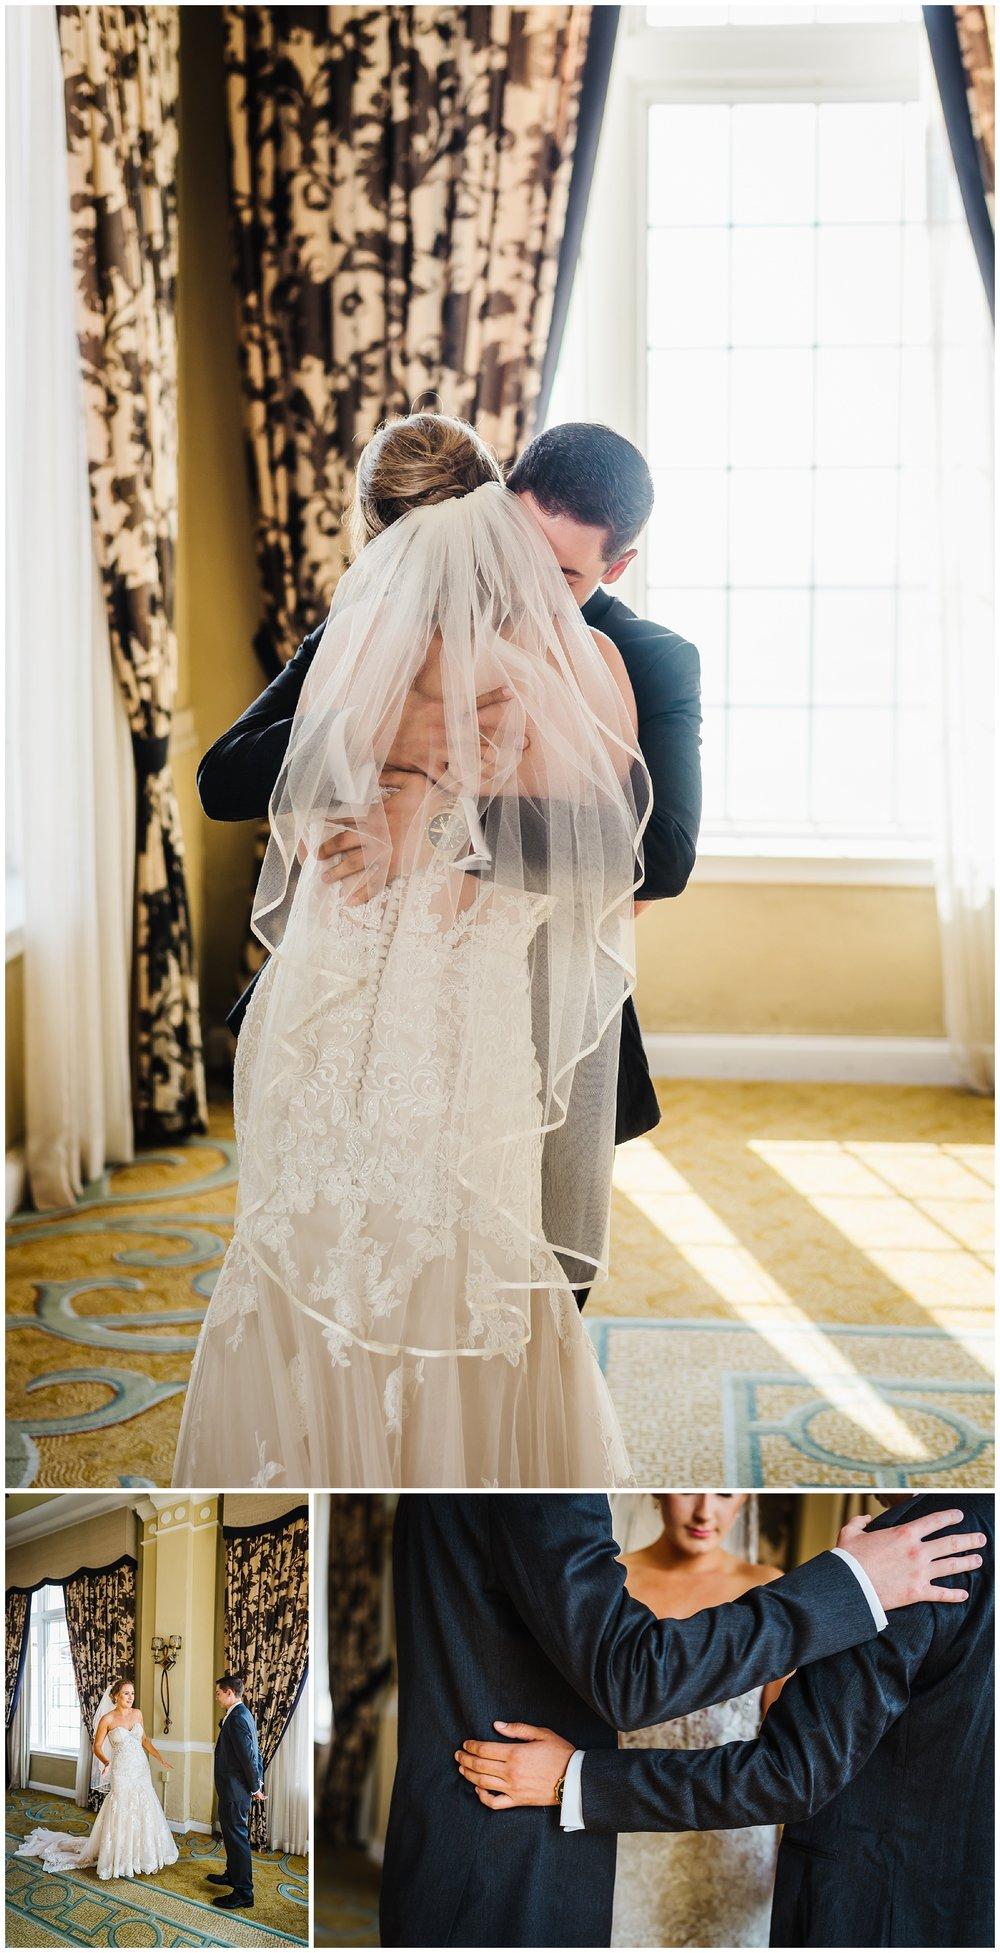 Tampa-wedding-photographer-bella-fleur-orchid-boquet-rsvb-events_0008.jpg